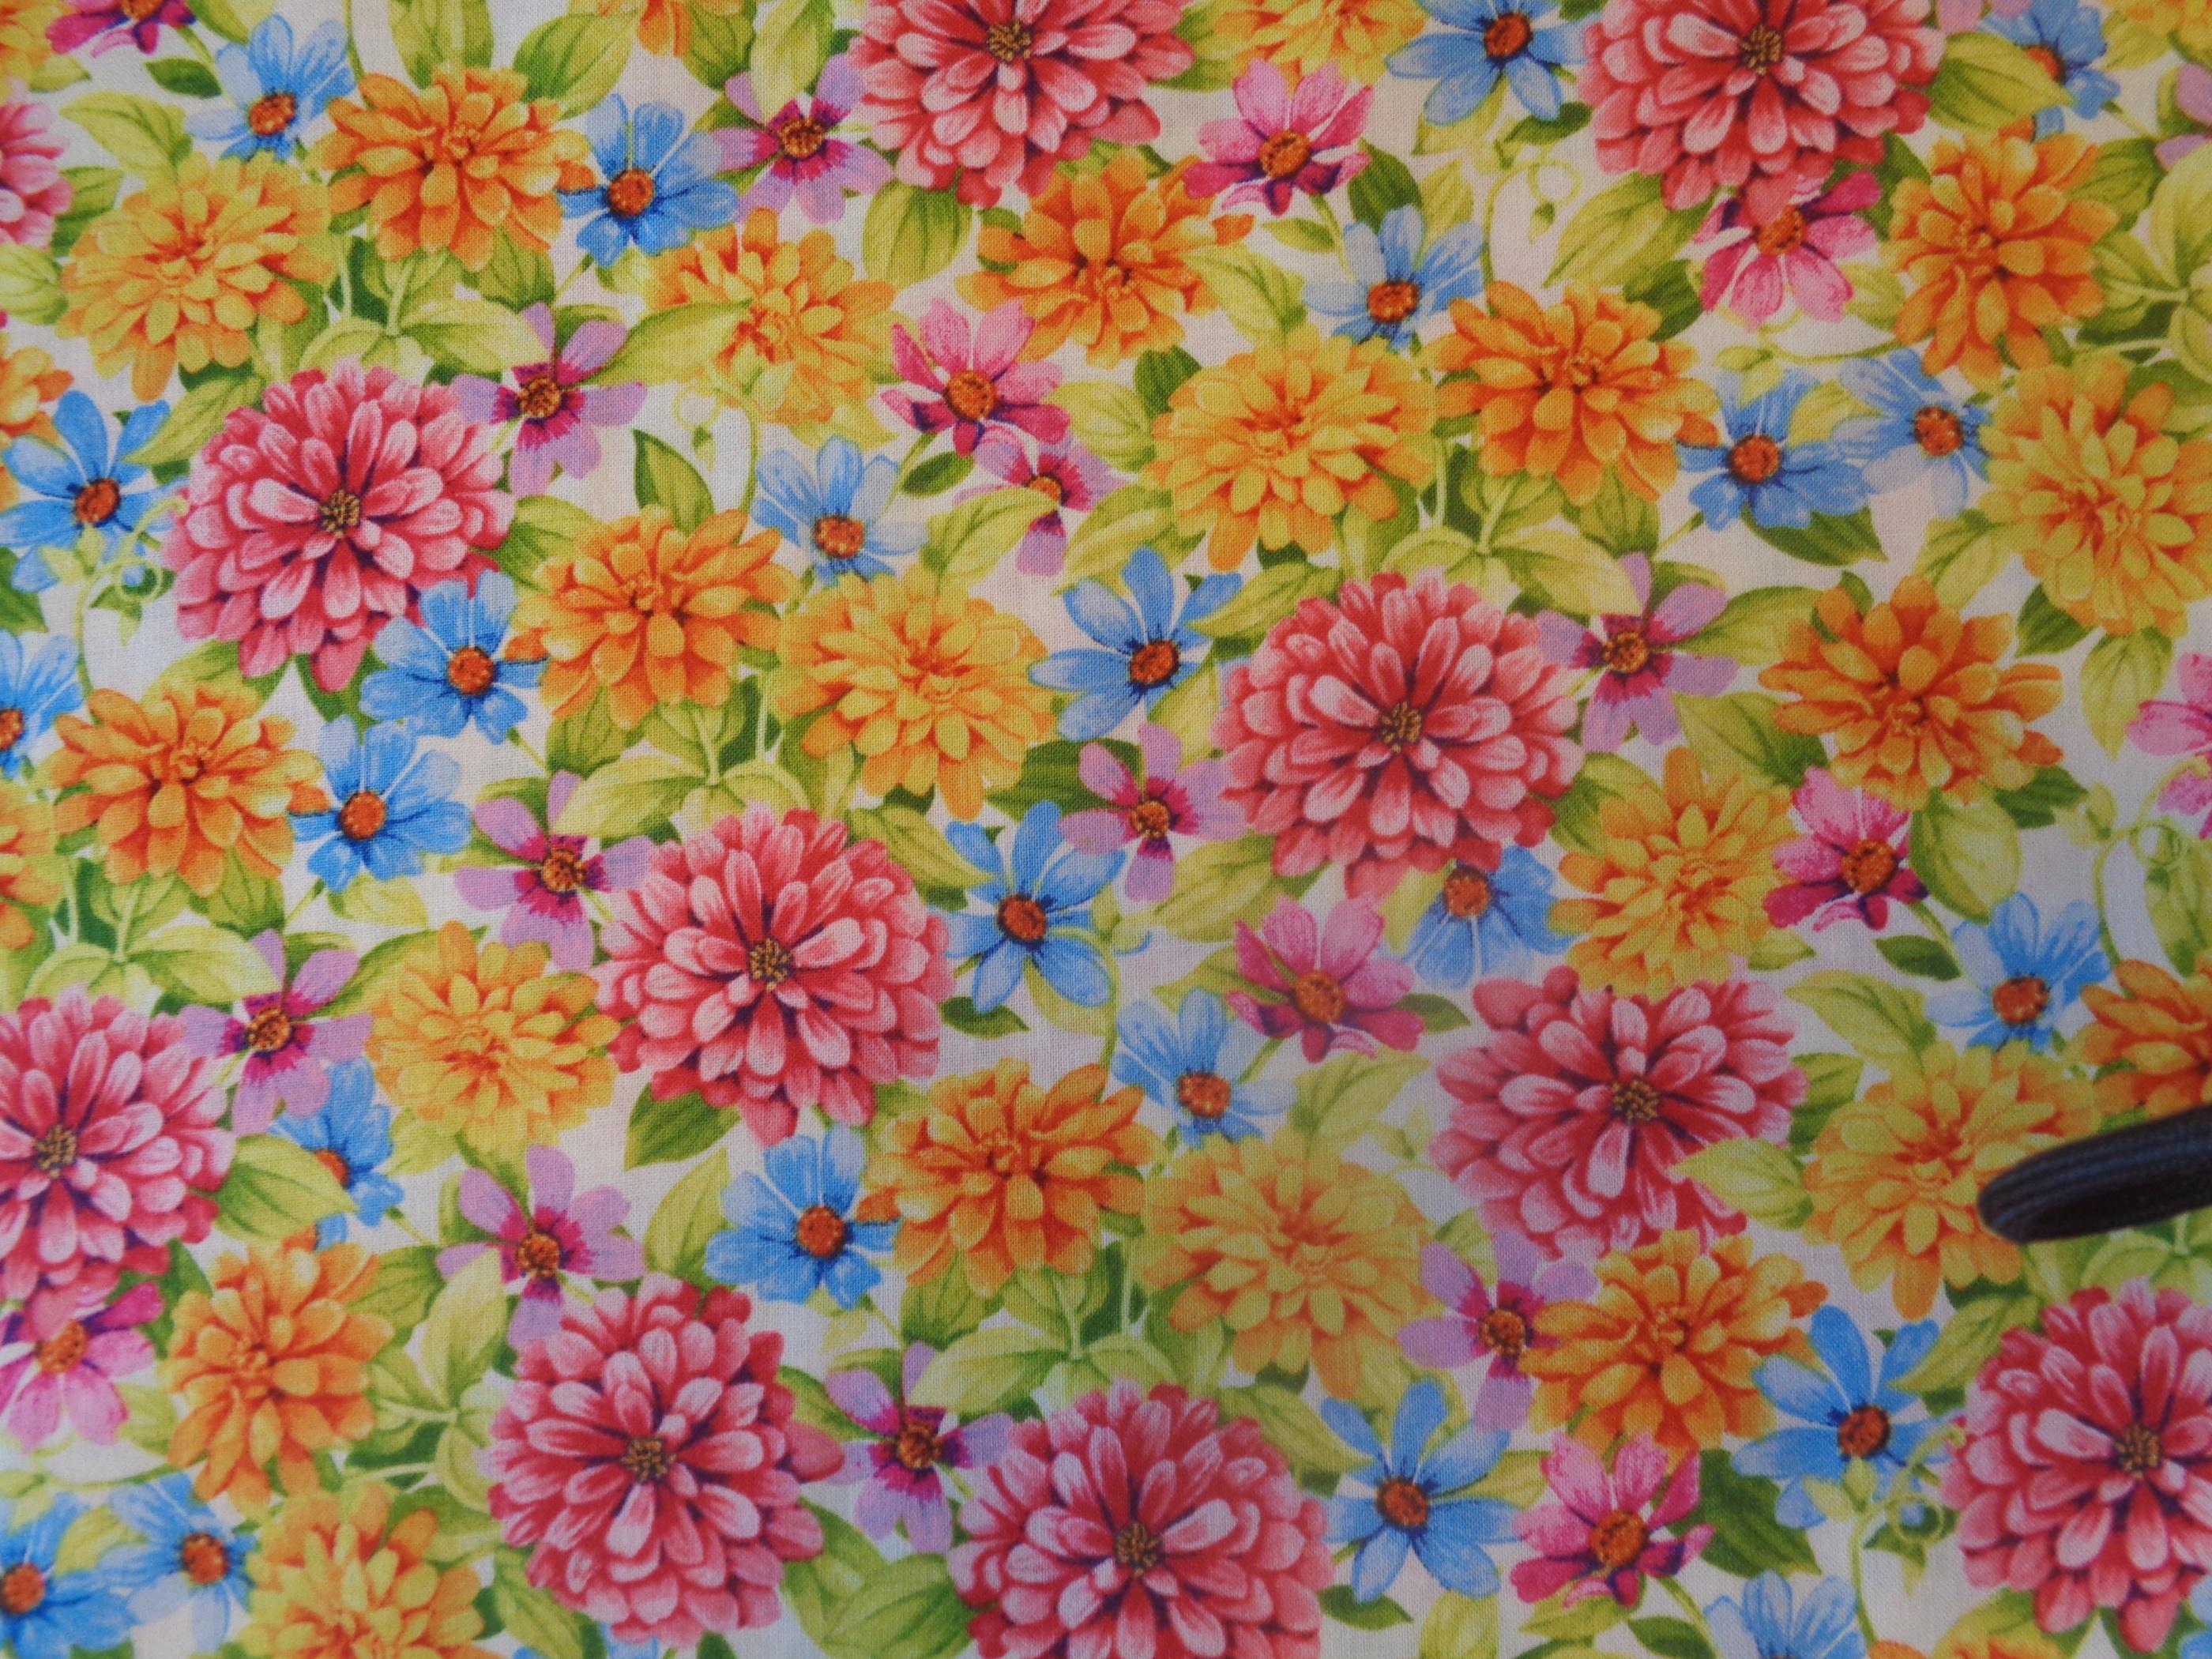 Blommigt bomullstyg/quilttyg - Adalee's Garden